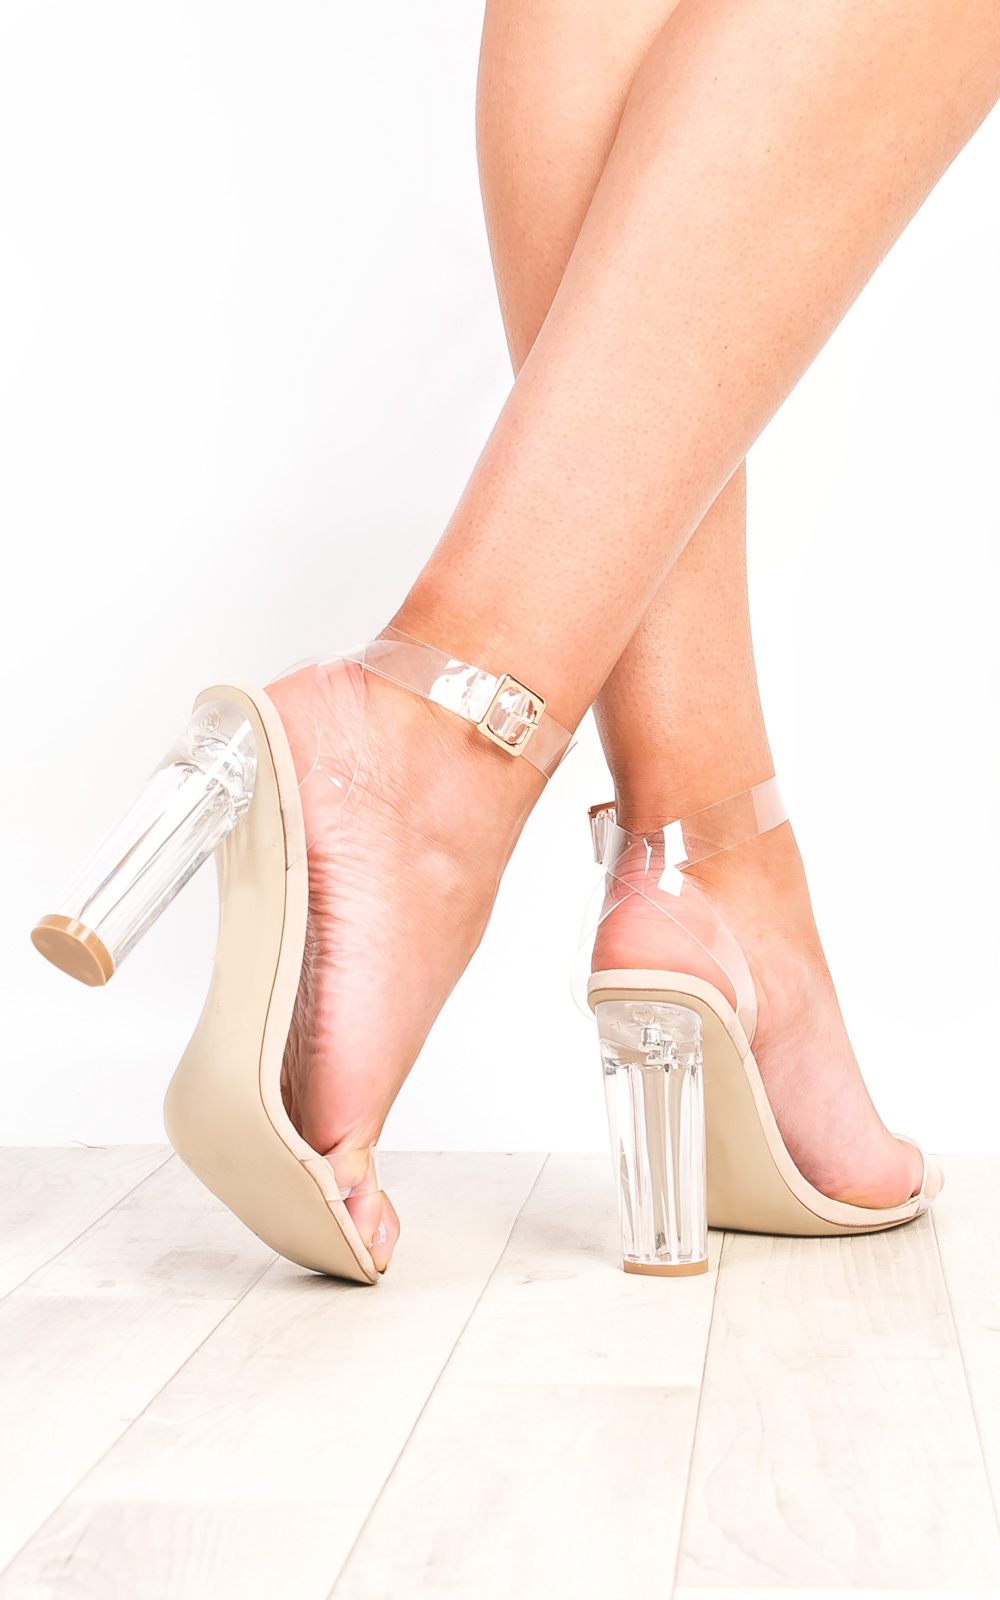 Shoes iKrush Alyssa Clear Perspex High Heels